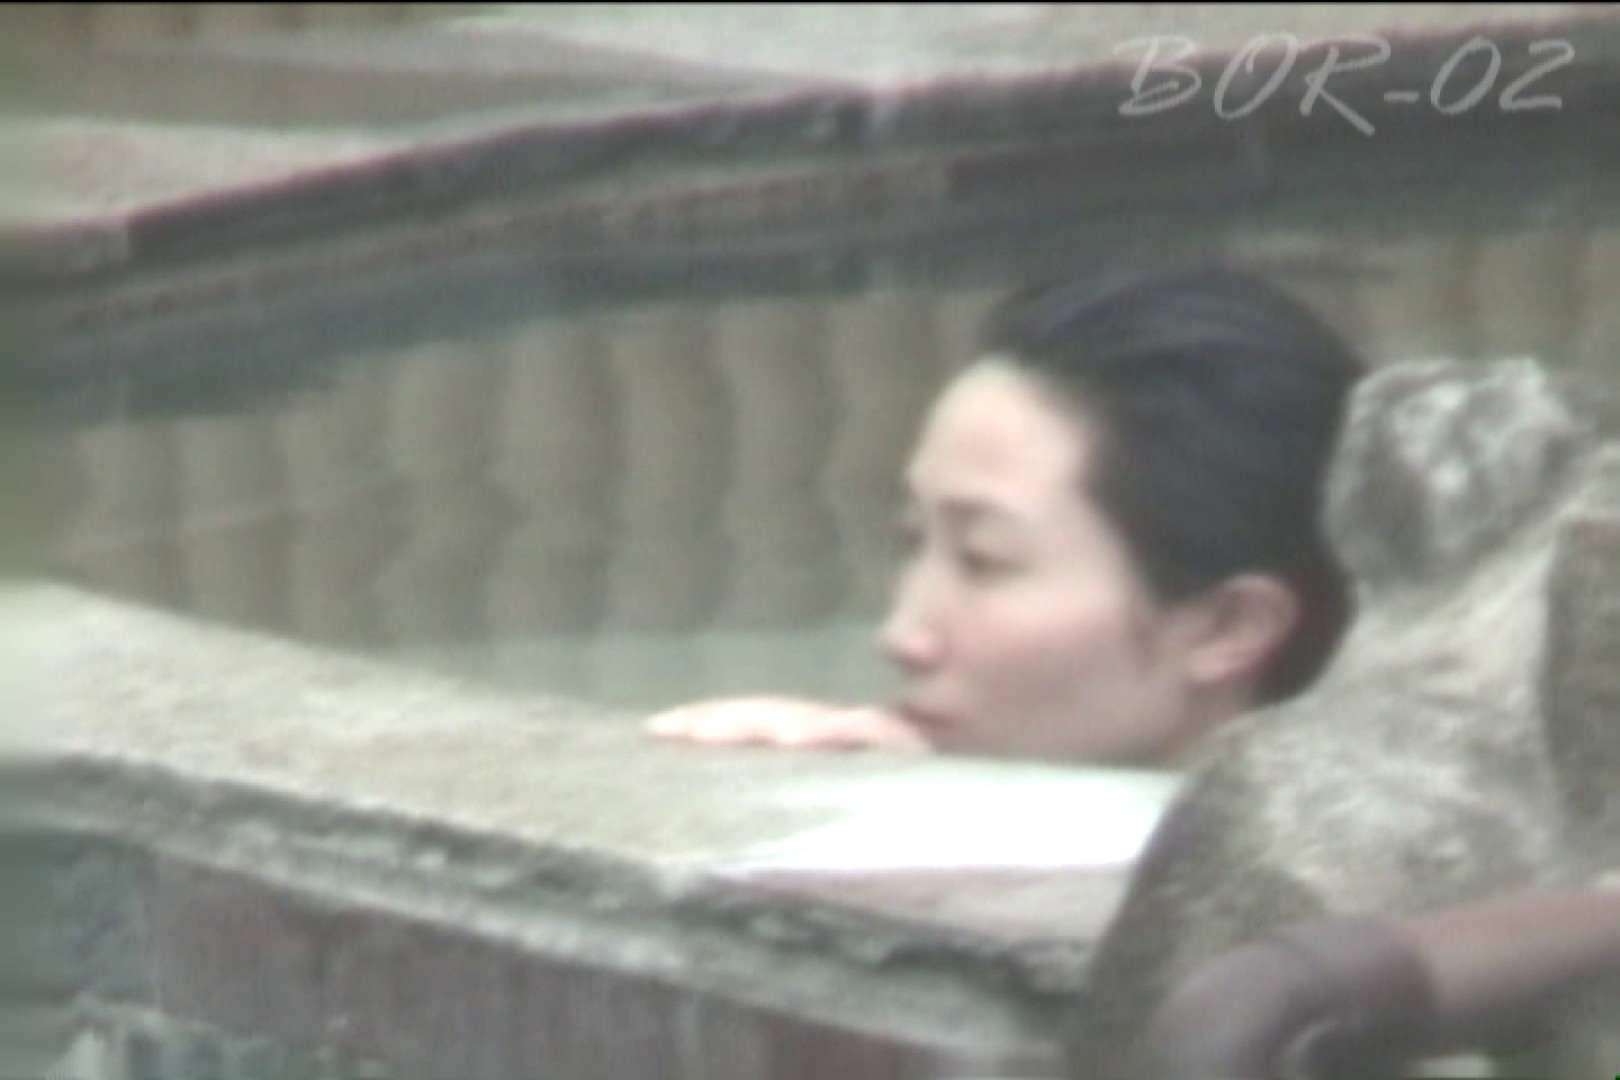 Aquaな露天風呂Vol.472 露天風呂突入 | 盗撮師作品  83pic 31